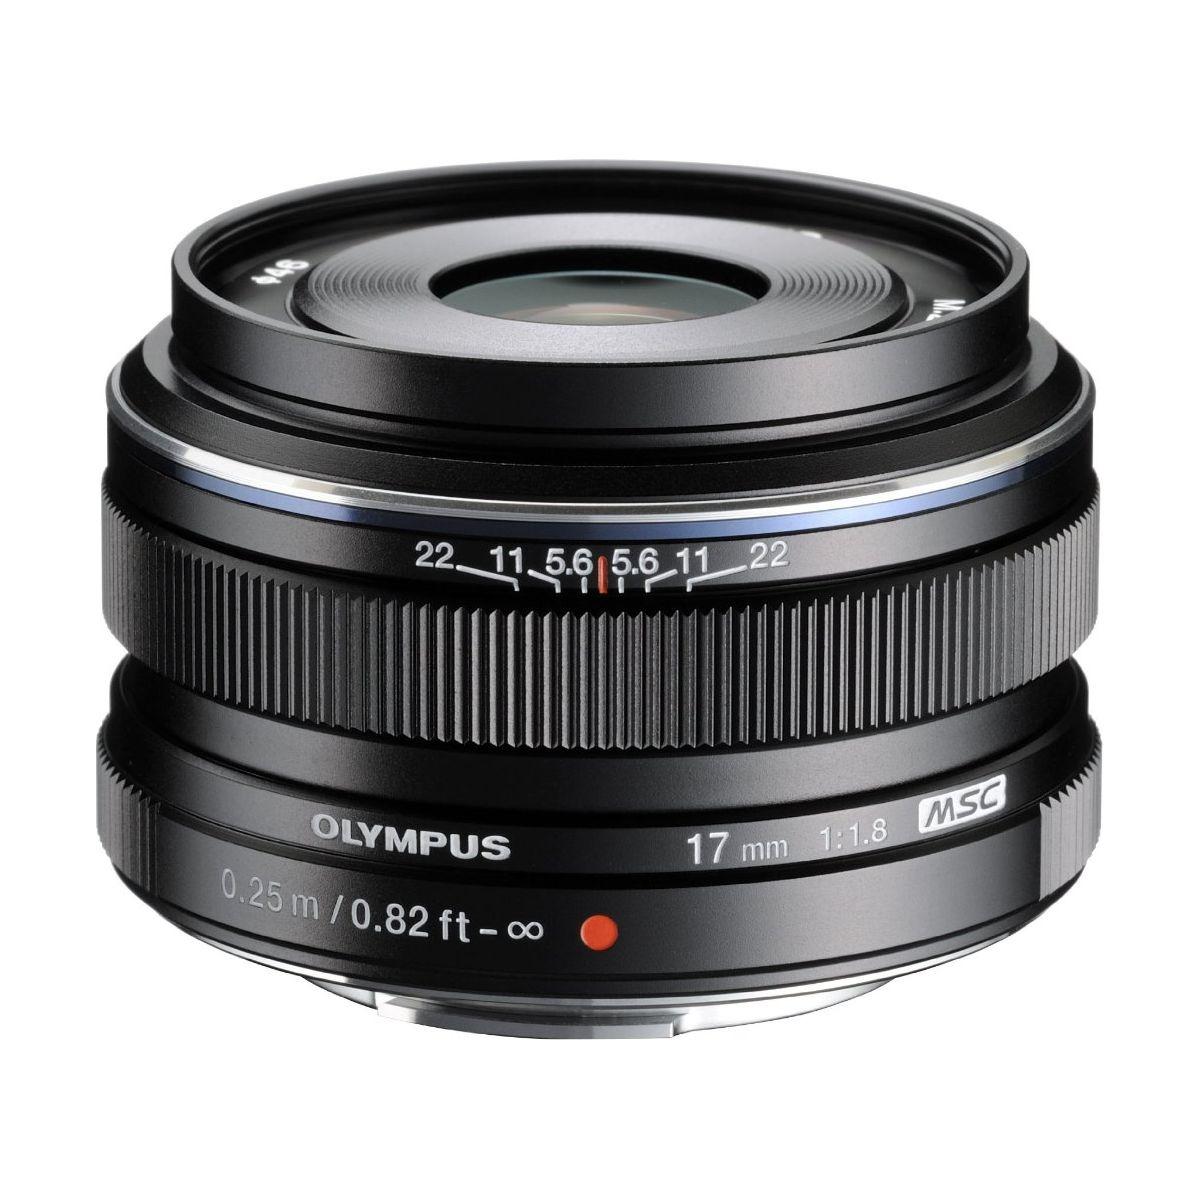 Objectif pour Hybride OLYMPUS 17mm f/1.8 noir M.Zuiko